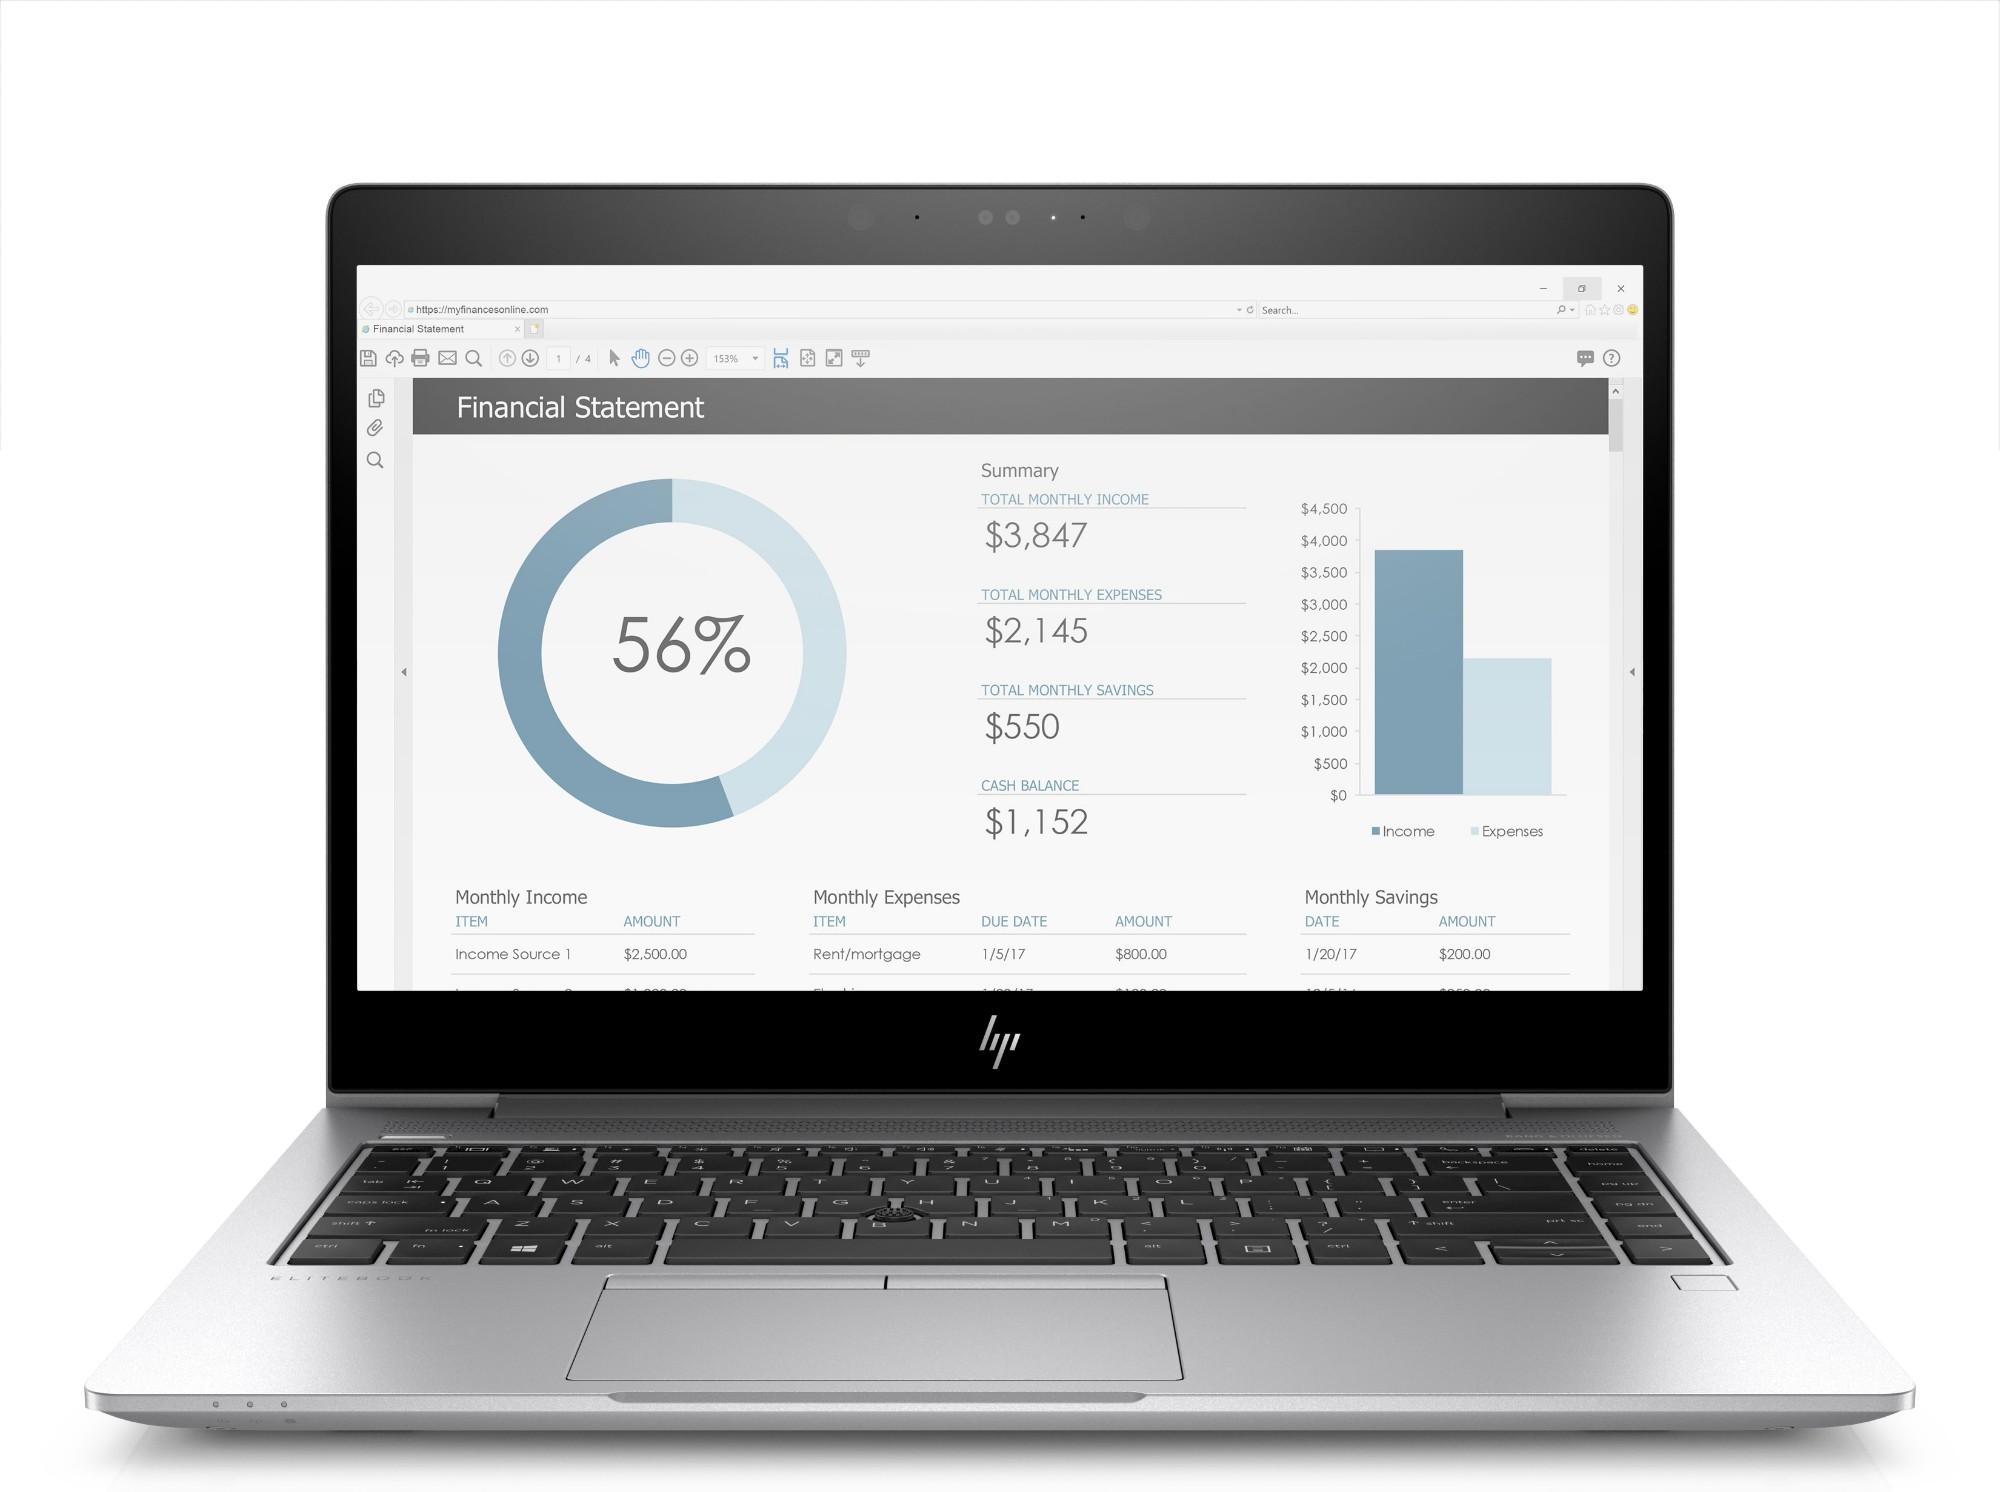 HP EliteBook x360 1040 G5 Black,Silver Hybrid (2-in-1) 35.6 cm (14